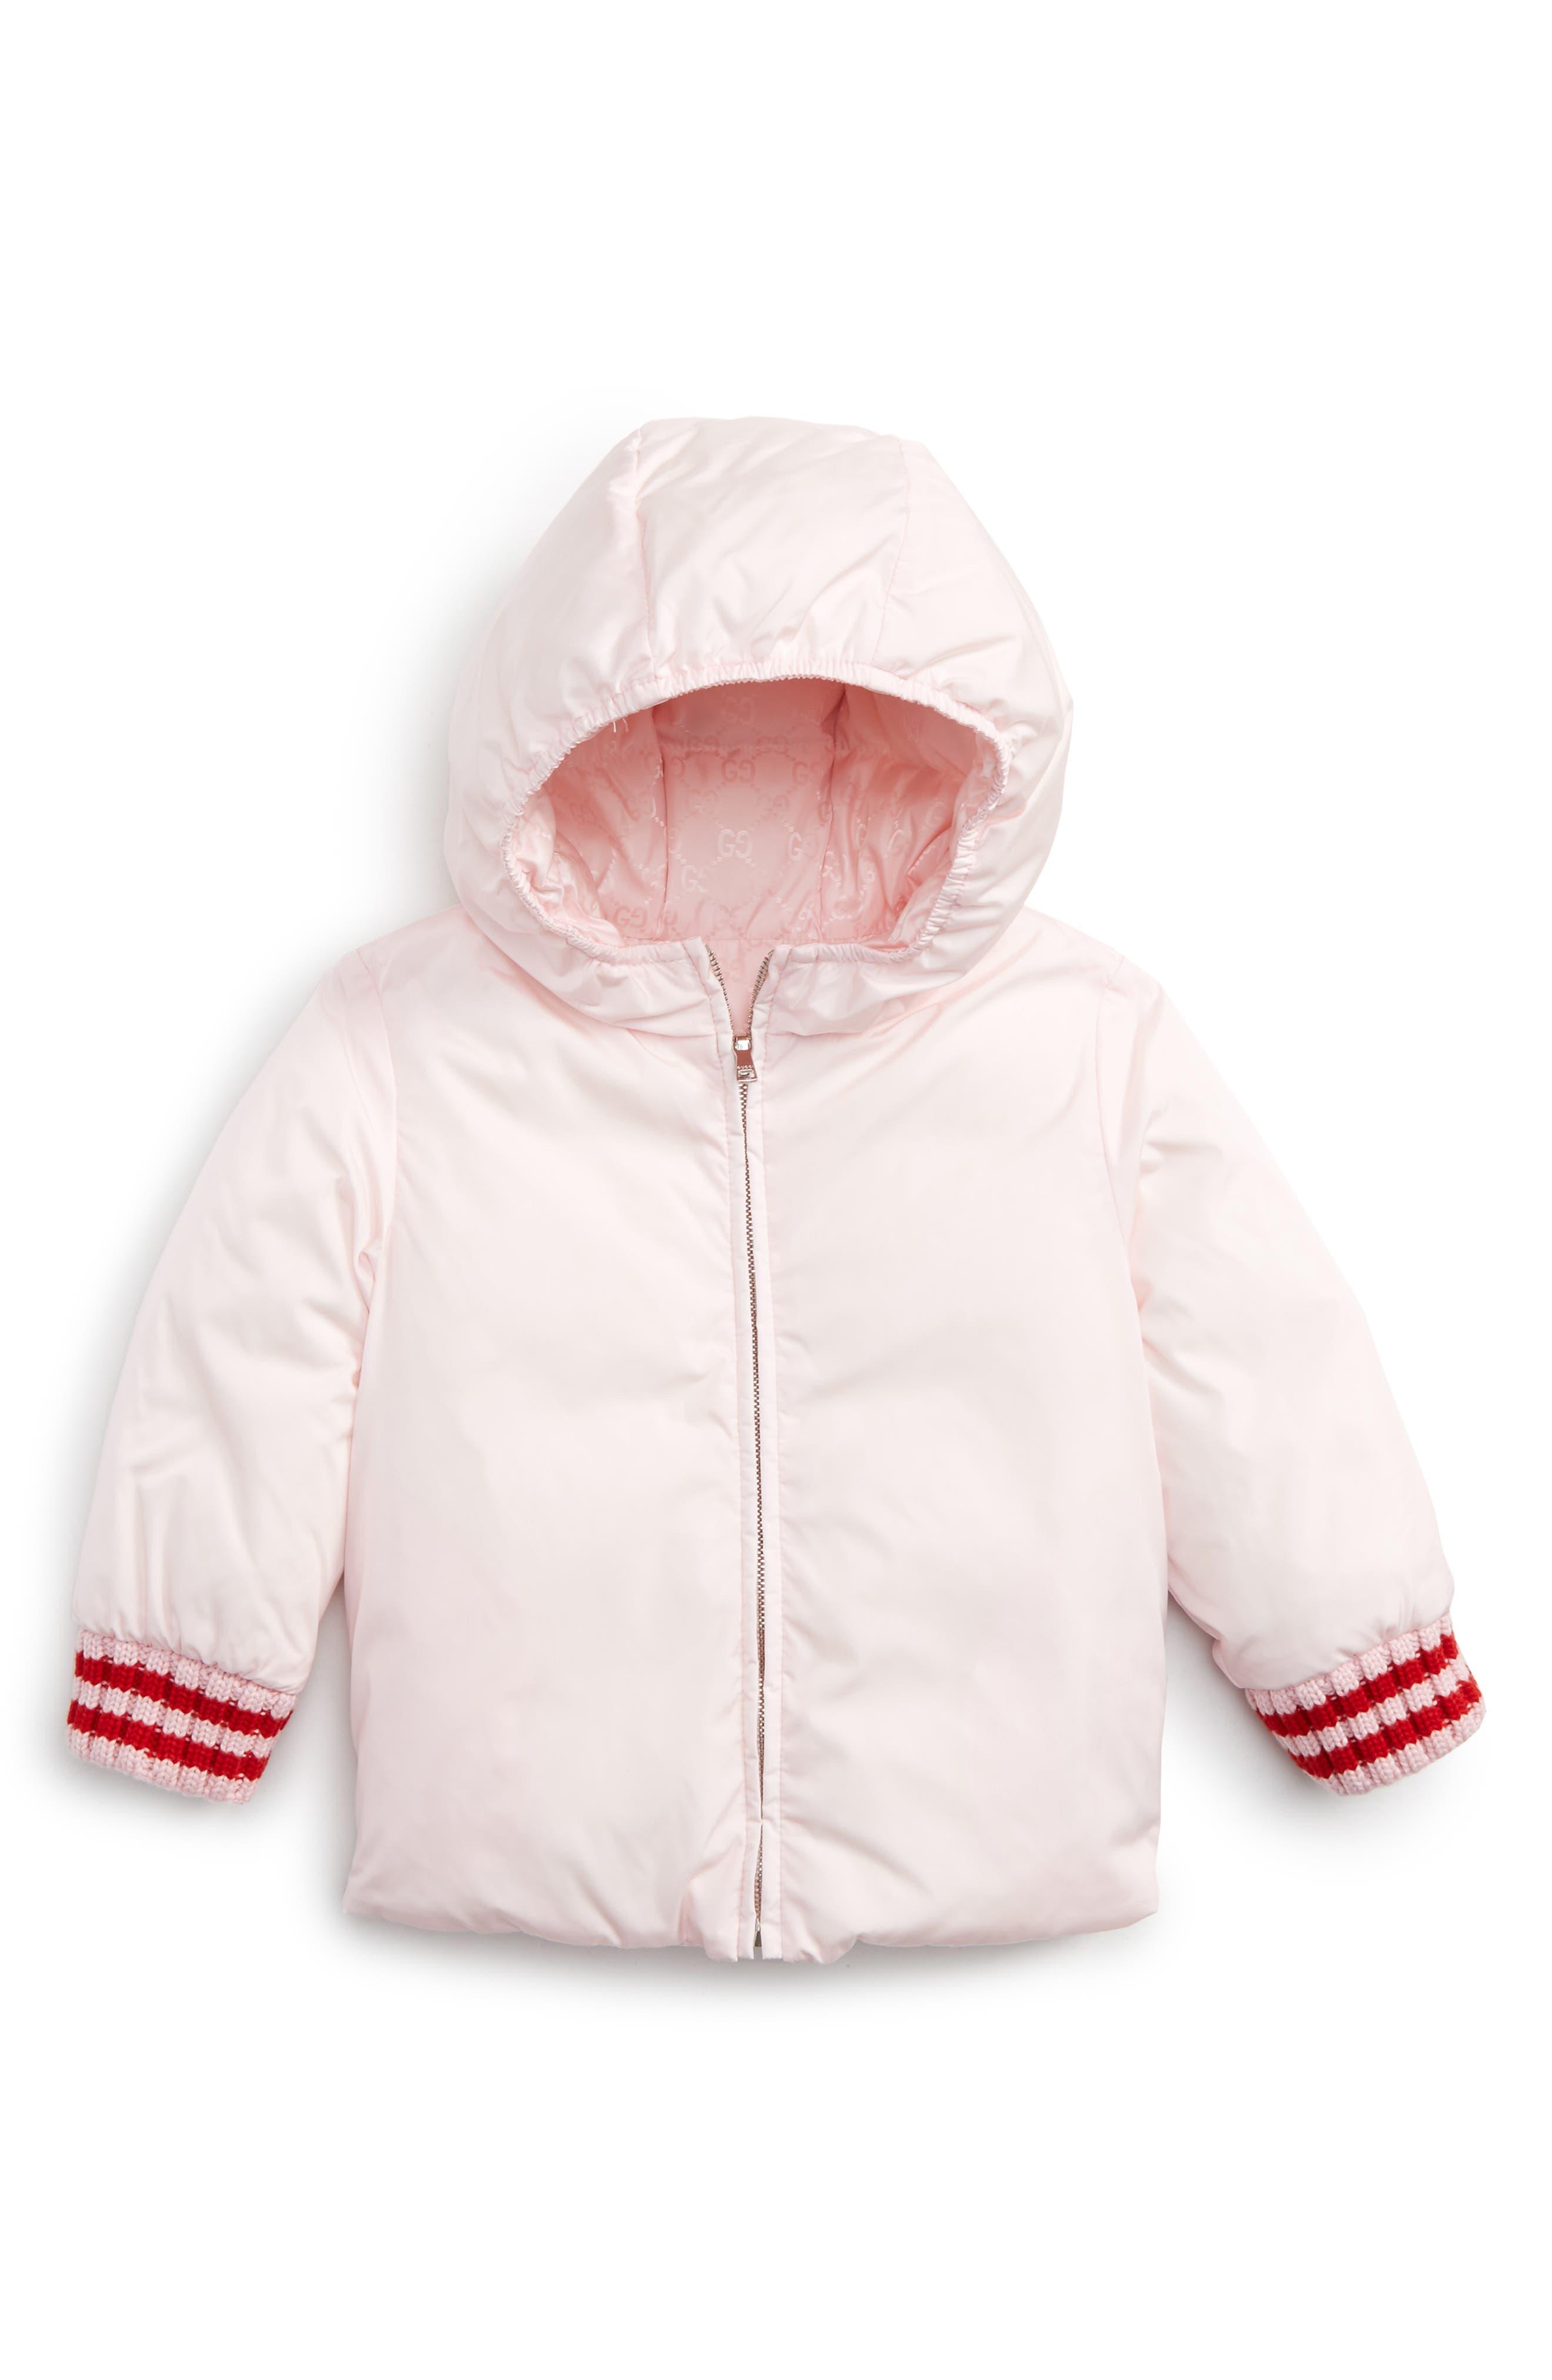 Reversible GG Jacquard Water-Resistant Down Jacket,                             Main thumbnail 1, color,                             667